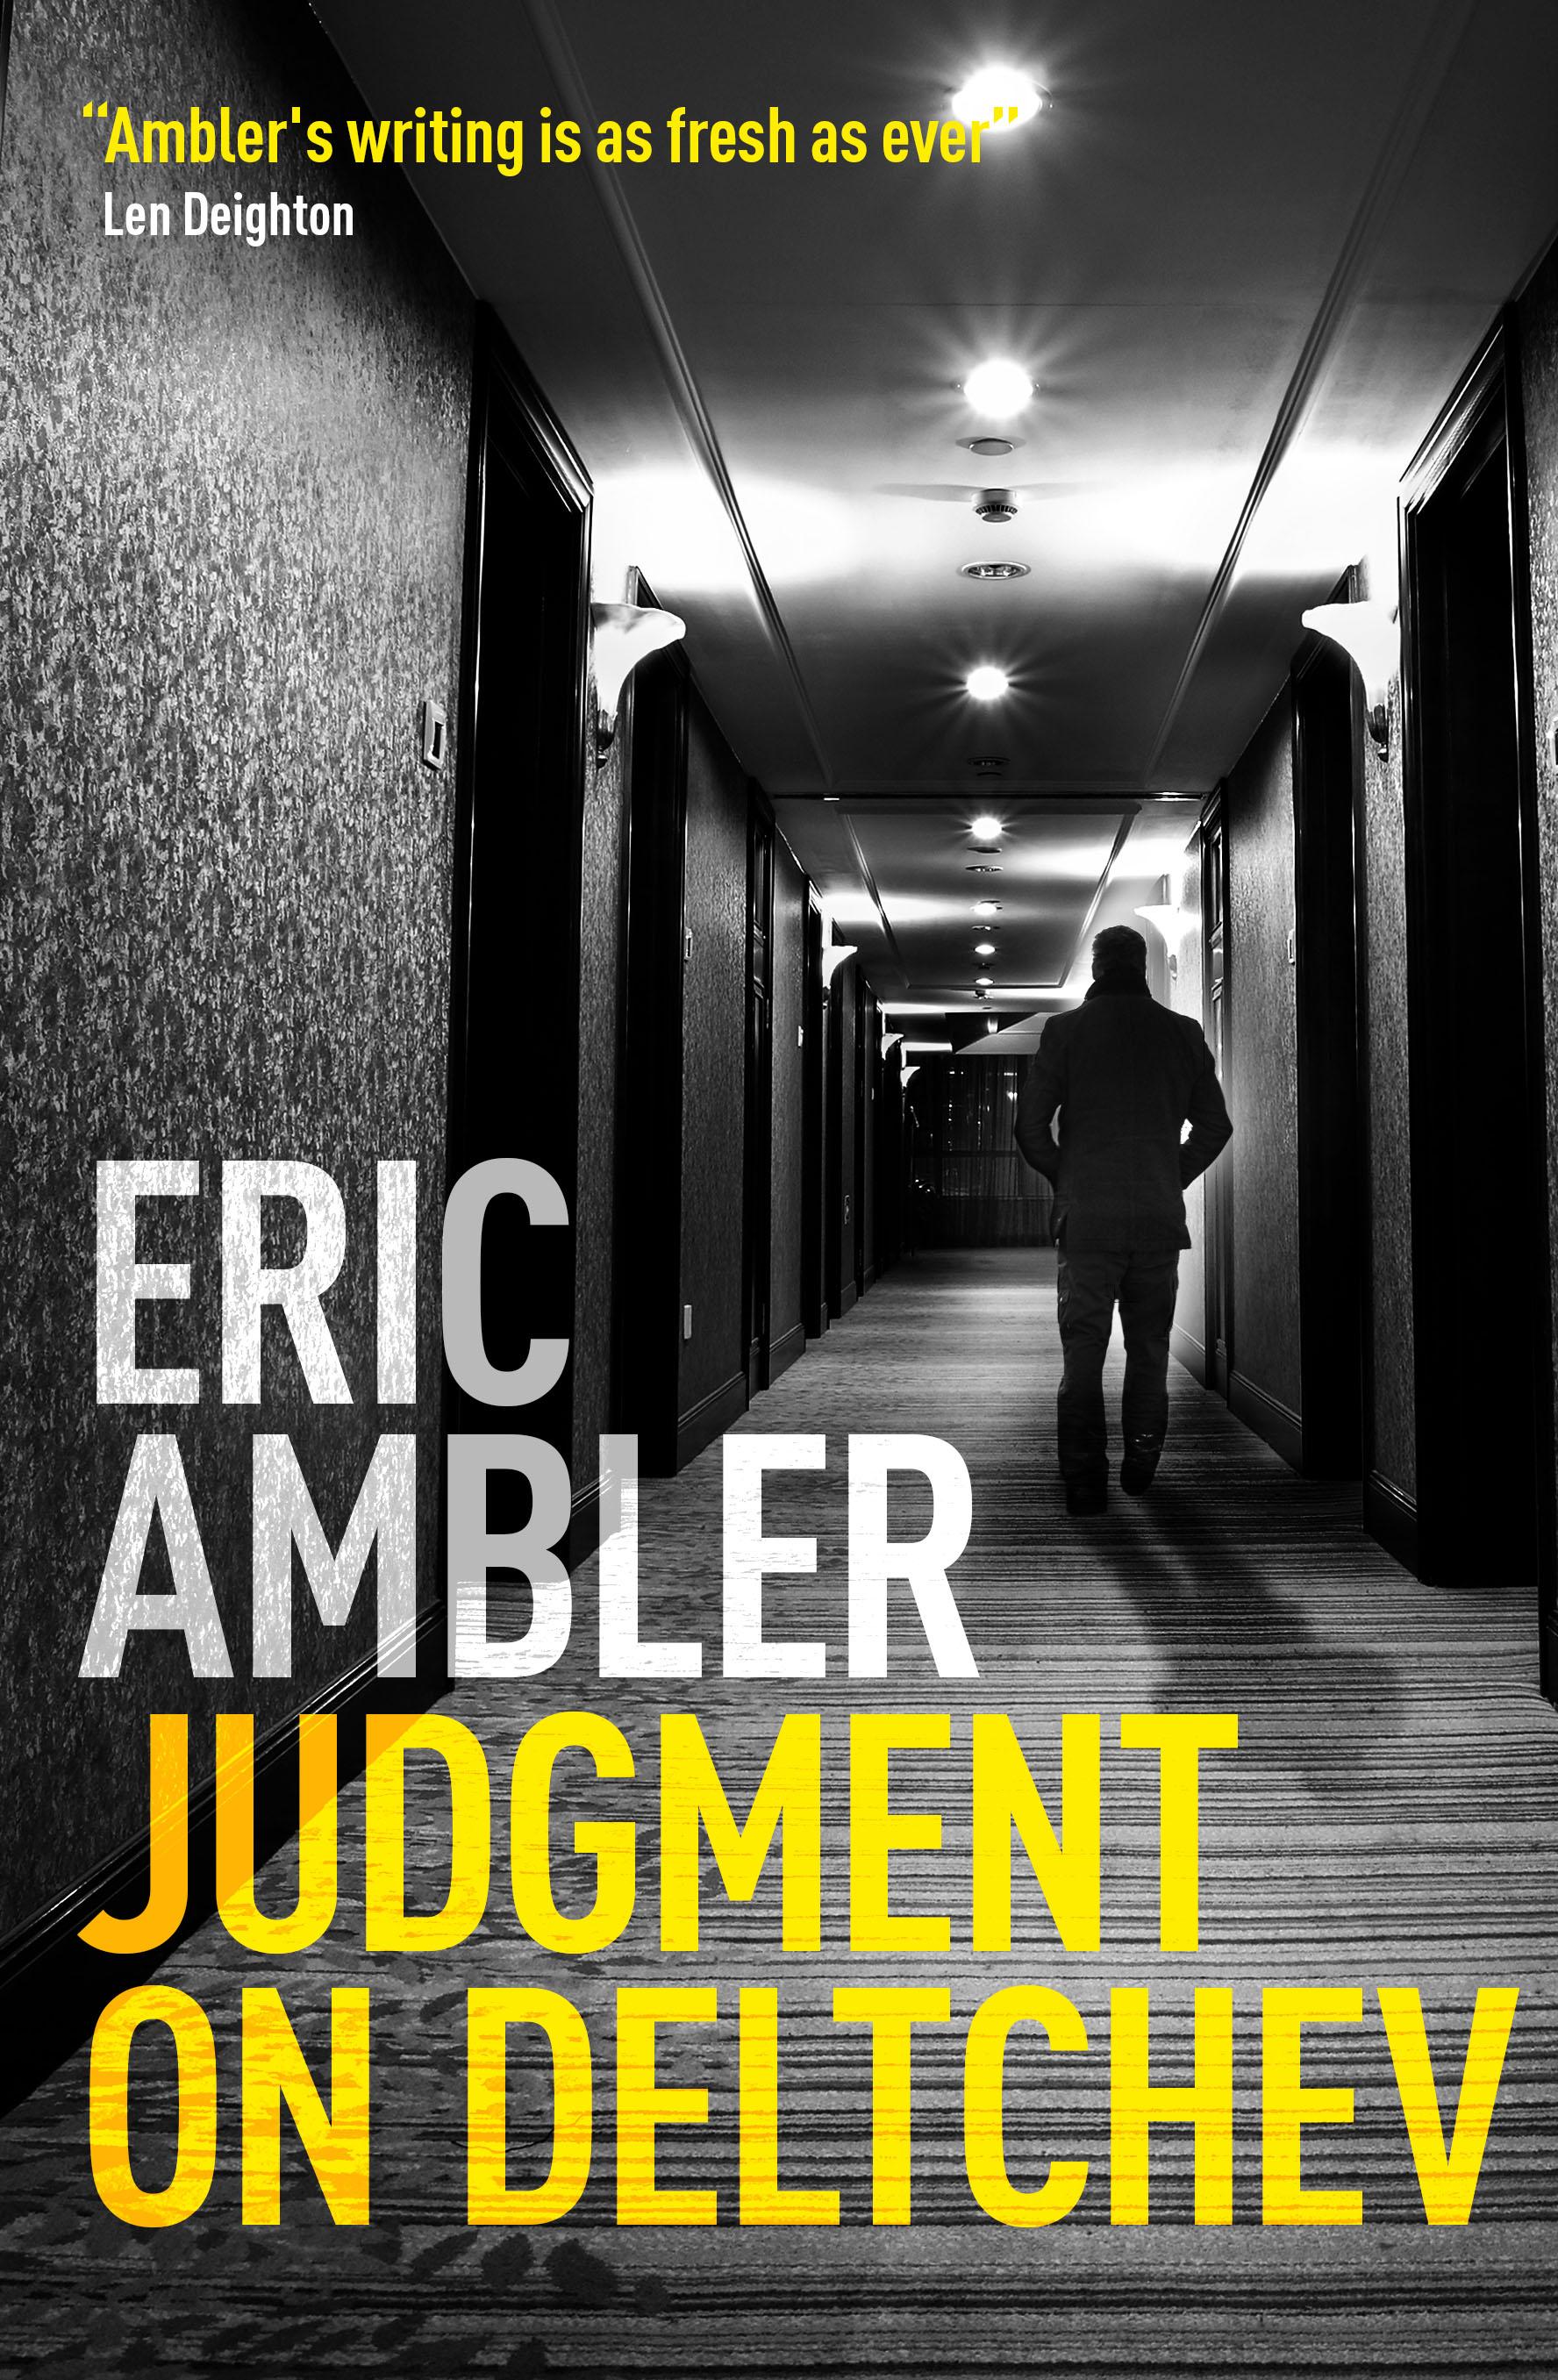 Order of Eric Ambler Books